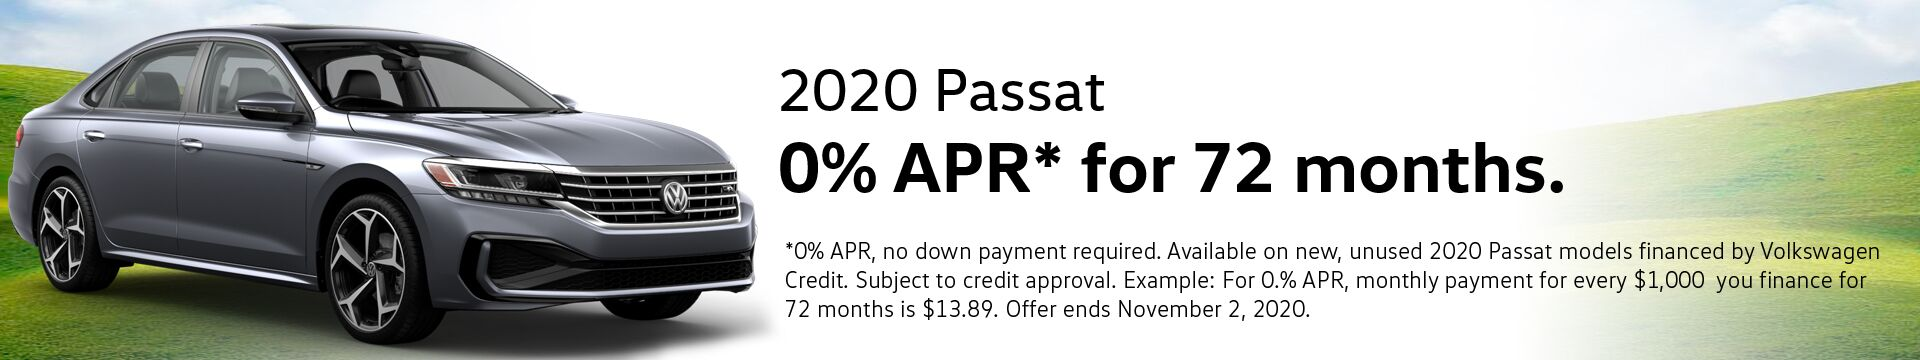 VW Passat Finance Special